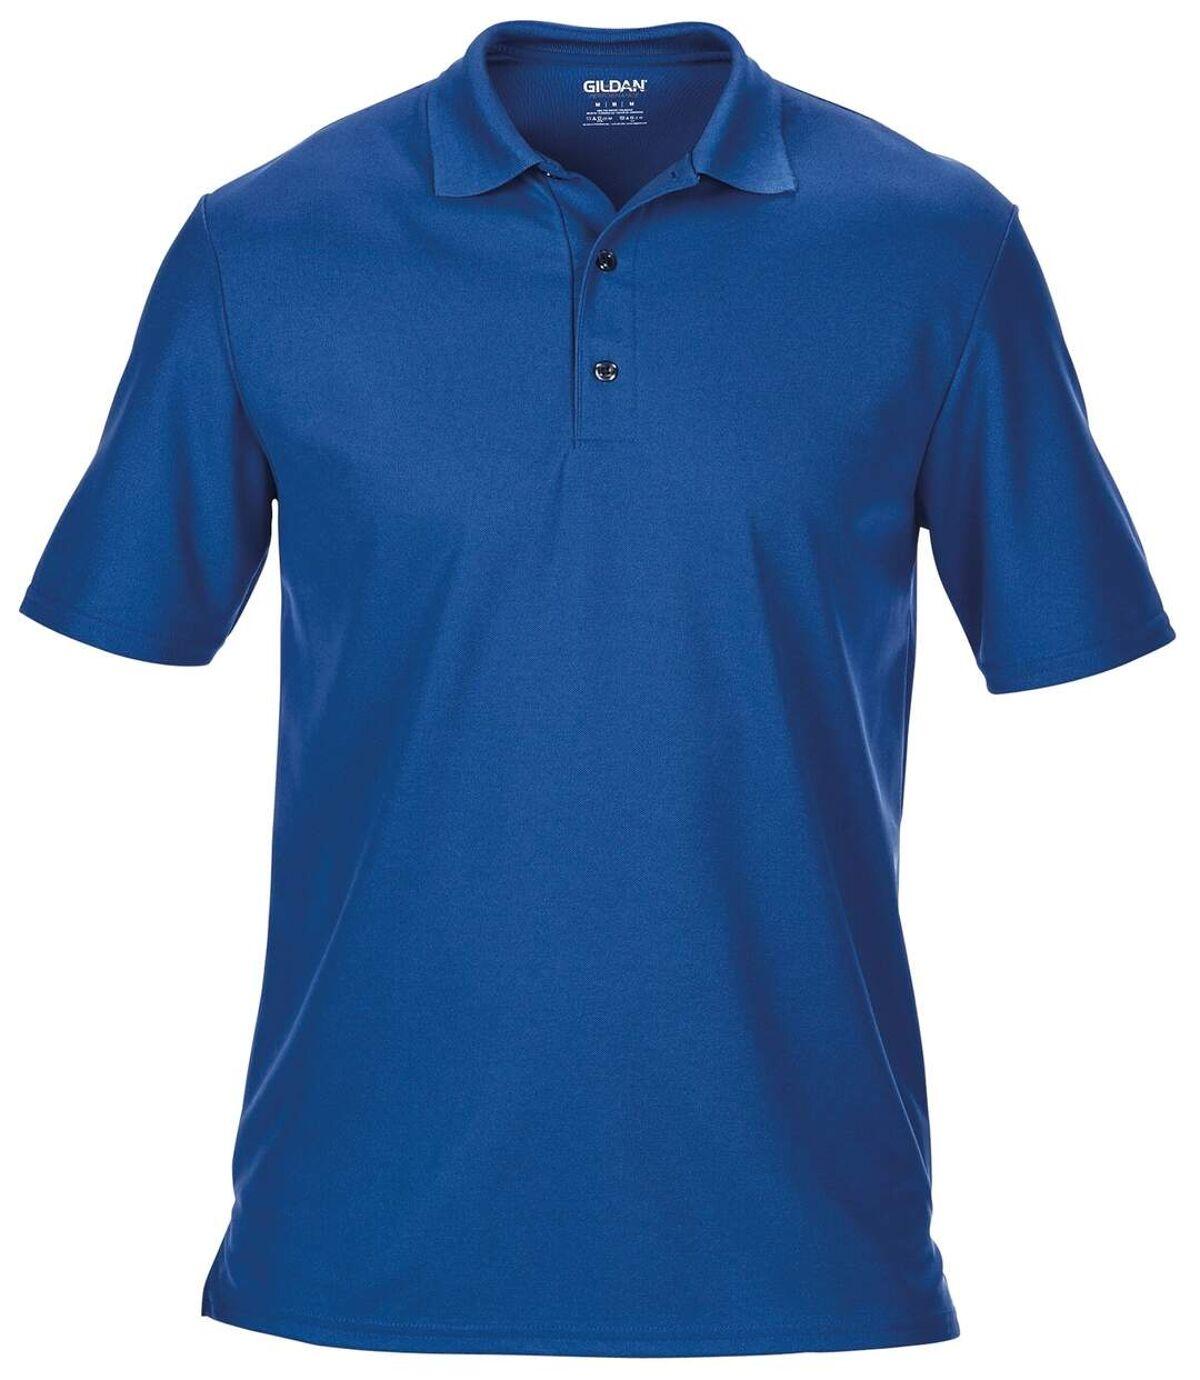 Gildan Mens Performance Sport Double Pique Polo Shirt (Royal) - UTBC3188